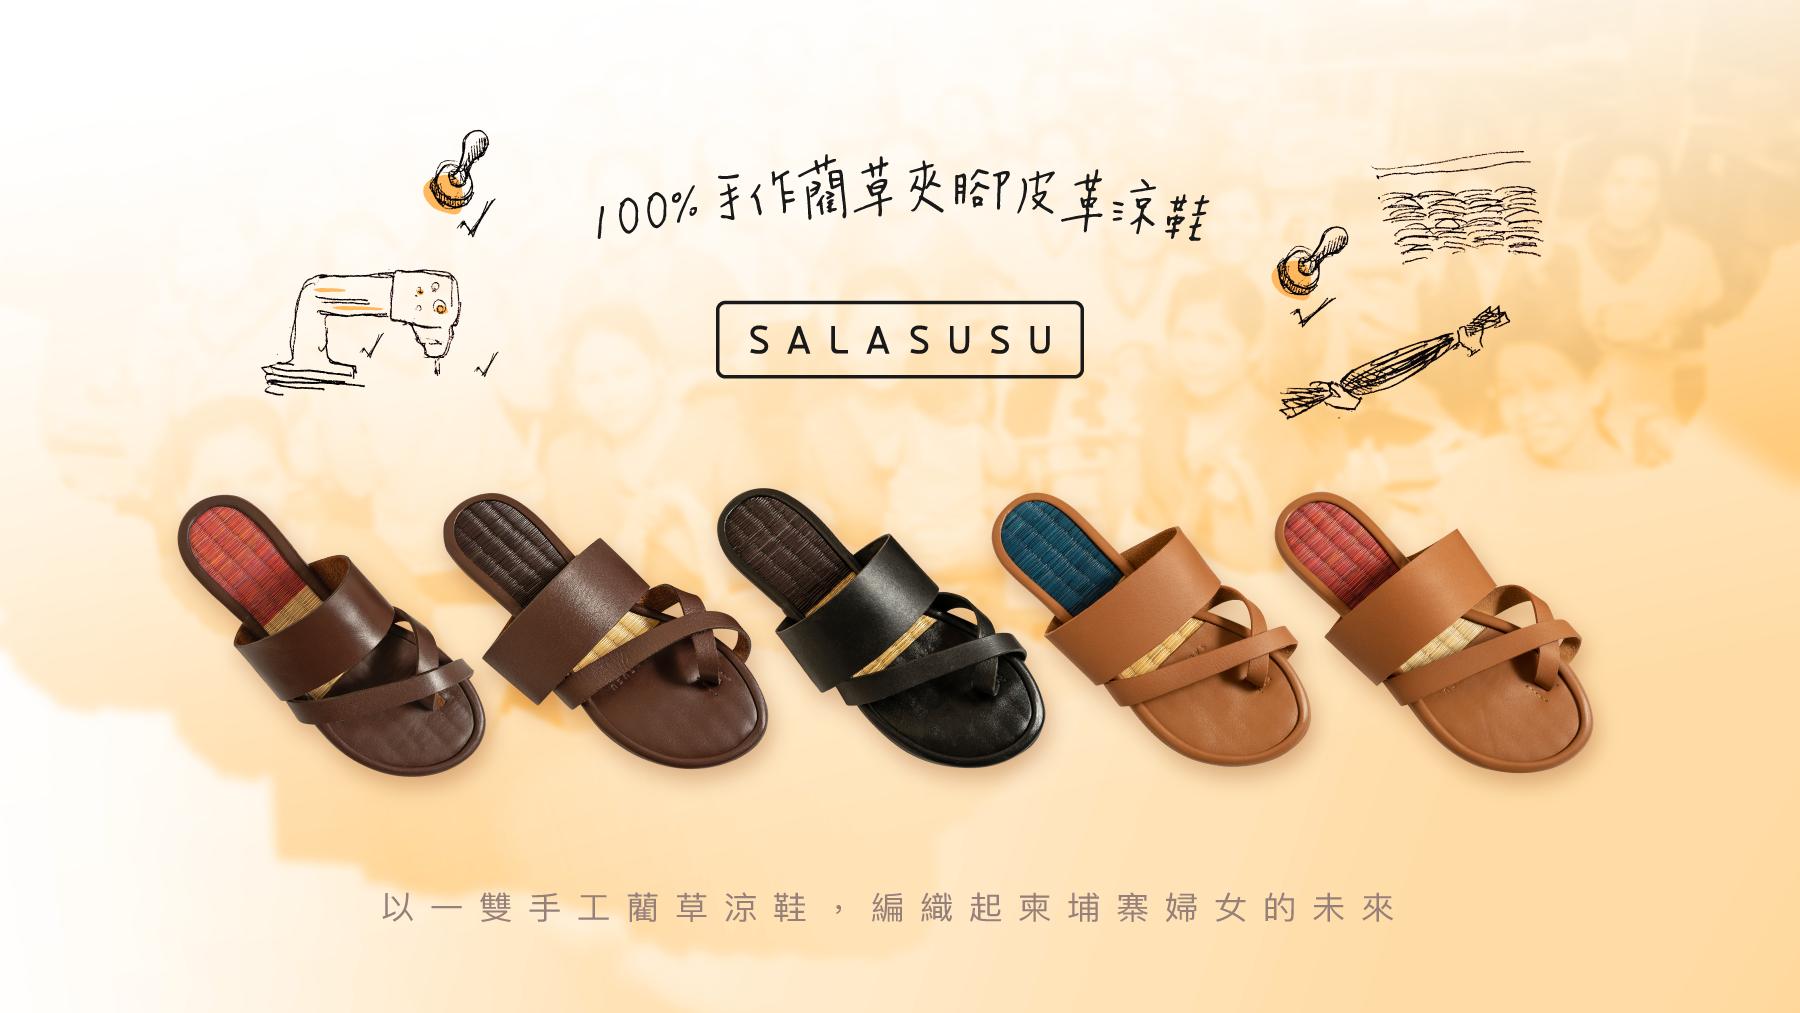 SALASUSU 柬埔寨生活風格品牌| 100% 手作藺草夾腳皮革涼鞋